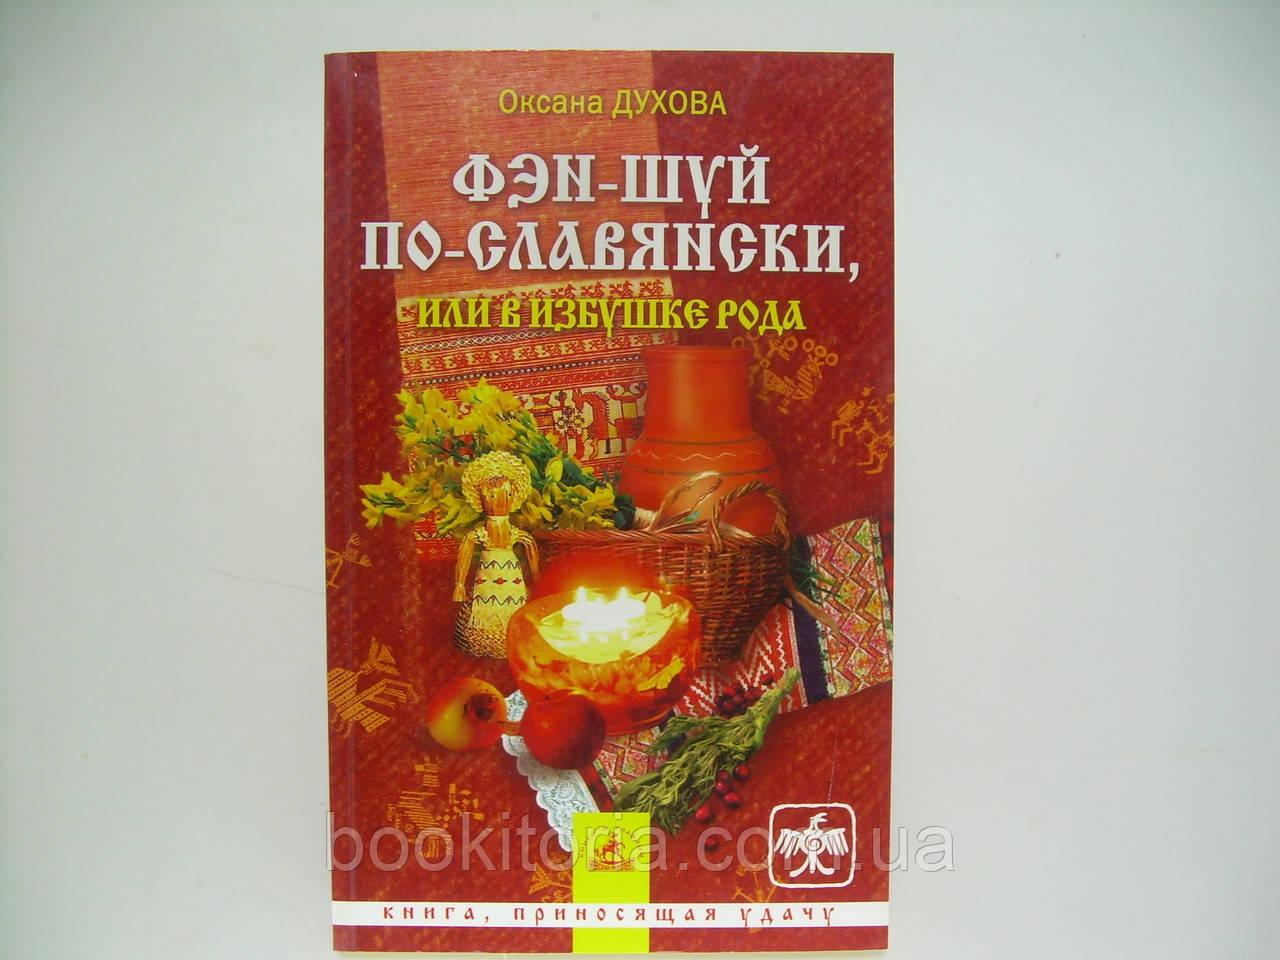 Духова О. Фэн-шуй по-славянски, или В избушке Рода (б/у).